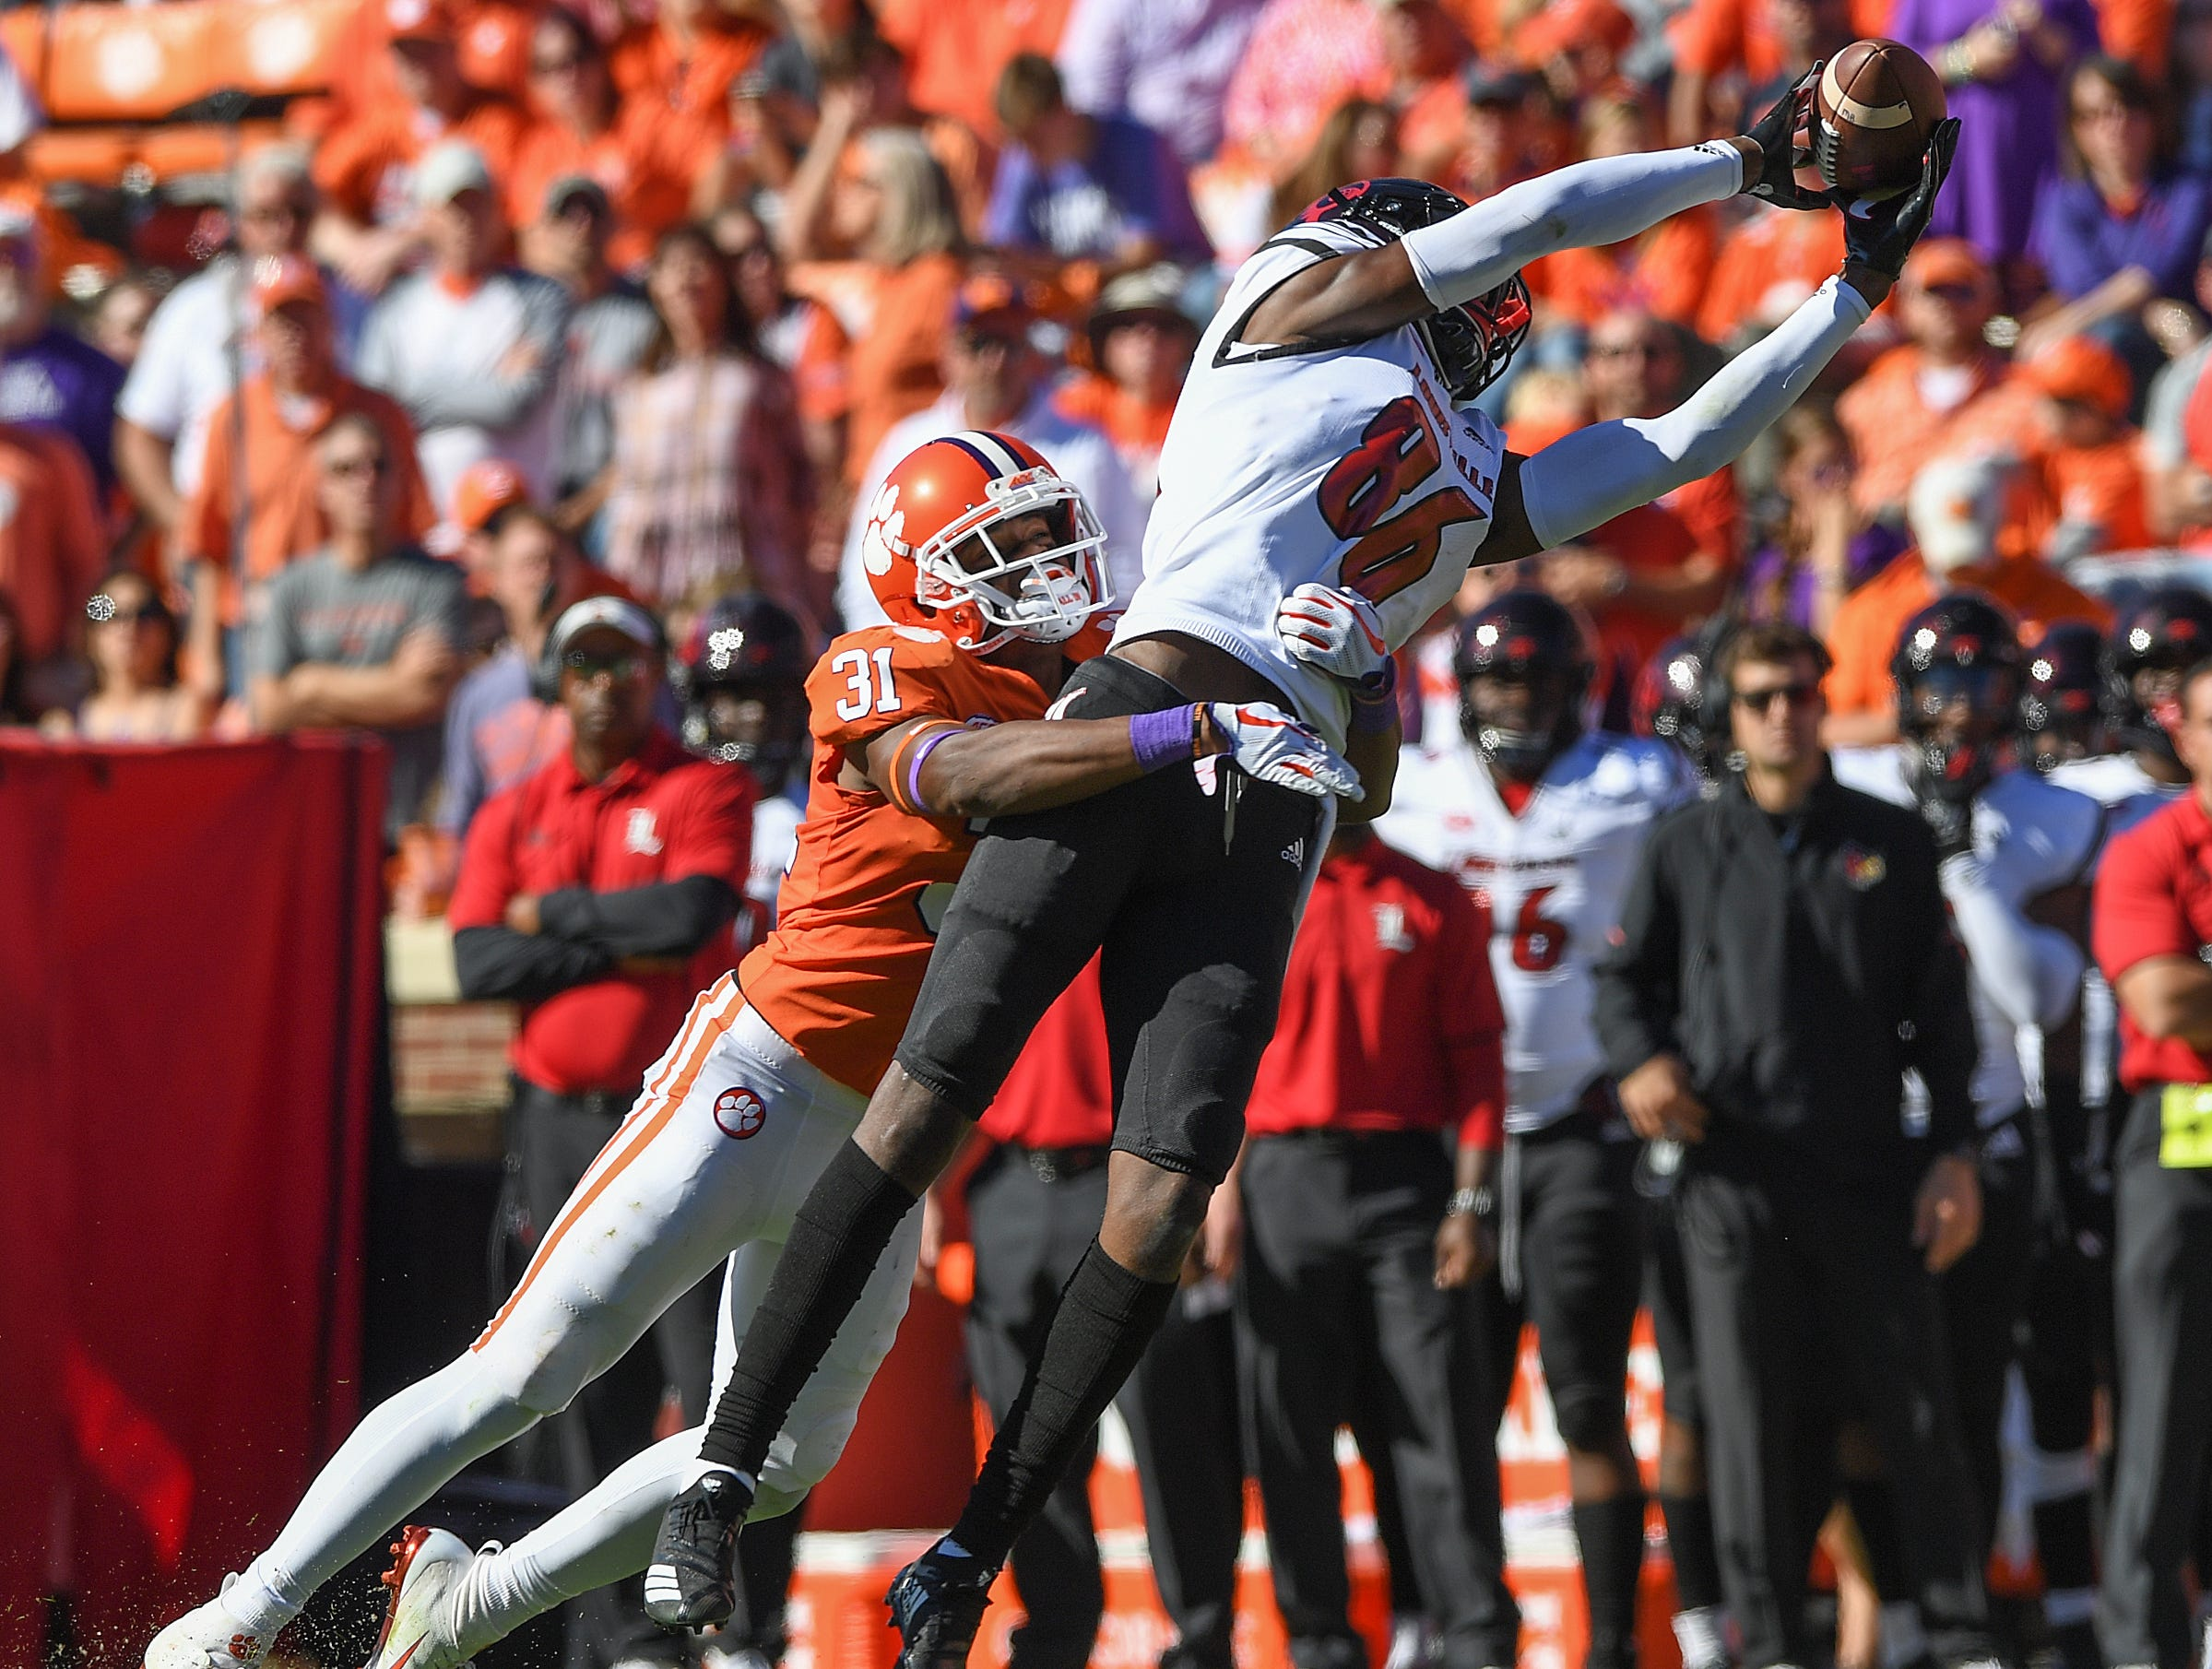 Clemson tight end Cole Renfrow (31) defends Louisville wide receiver Devante Peete (86) during the 3rd quarter Saturday, November 3, 2018 at Clemson's Memorial Stadium.